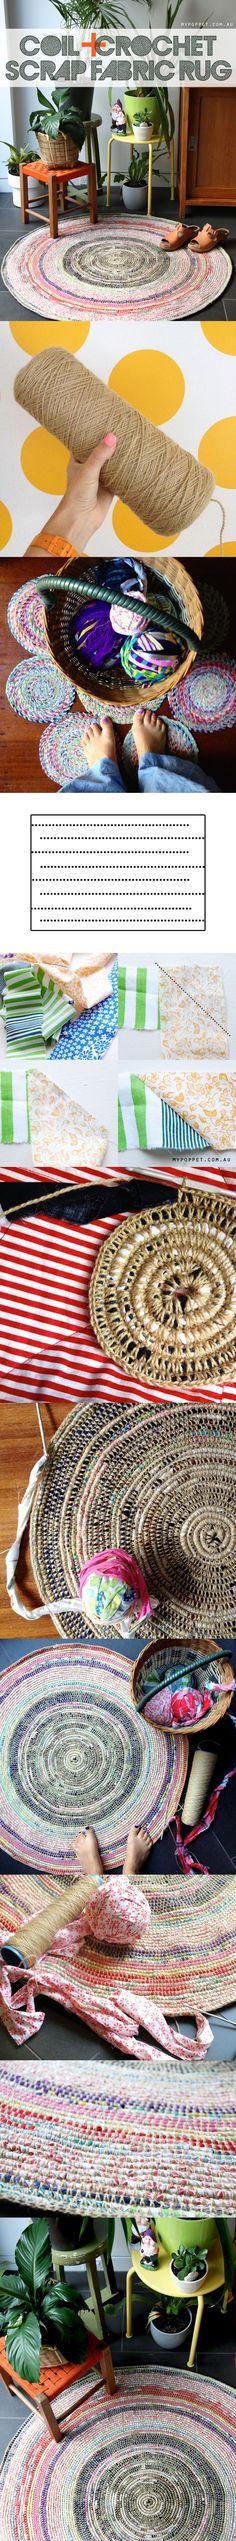 Recicla tus telas viejas: Alfombra de crochet - Vía http://mypoppet.com.au/